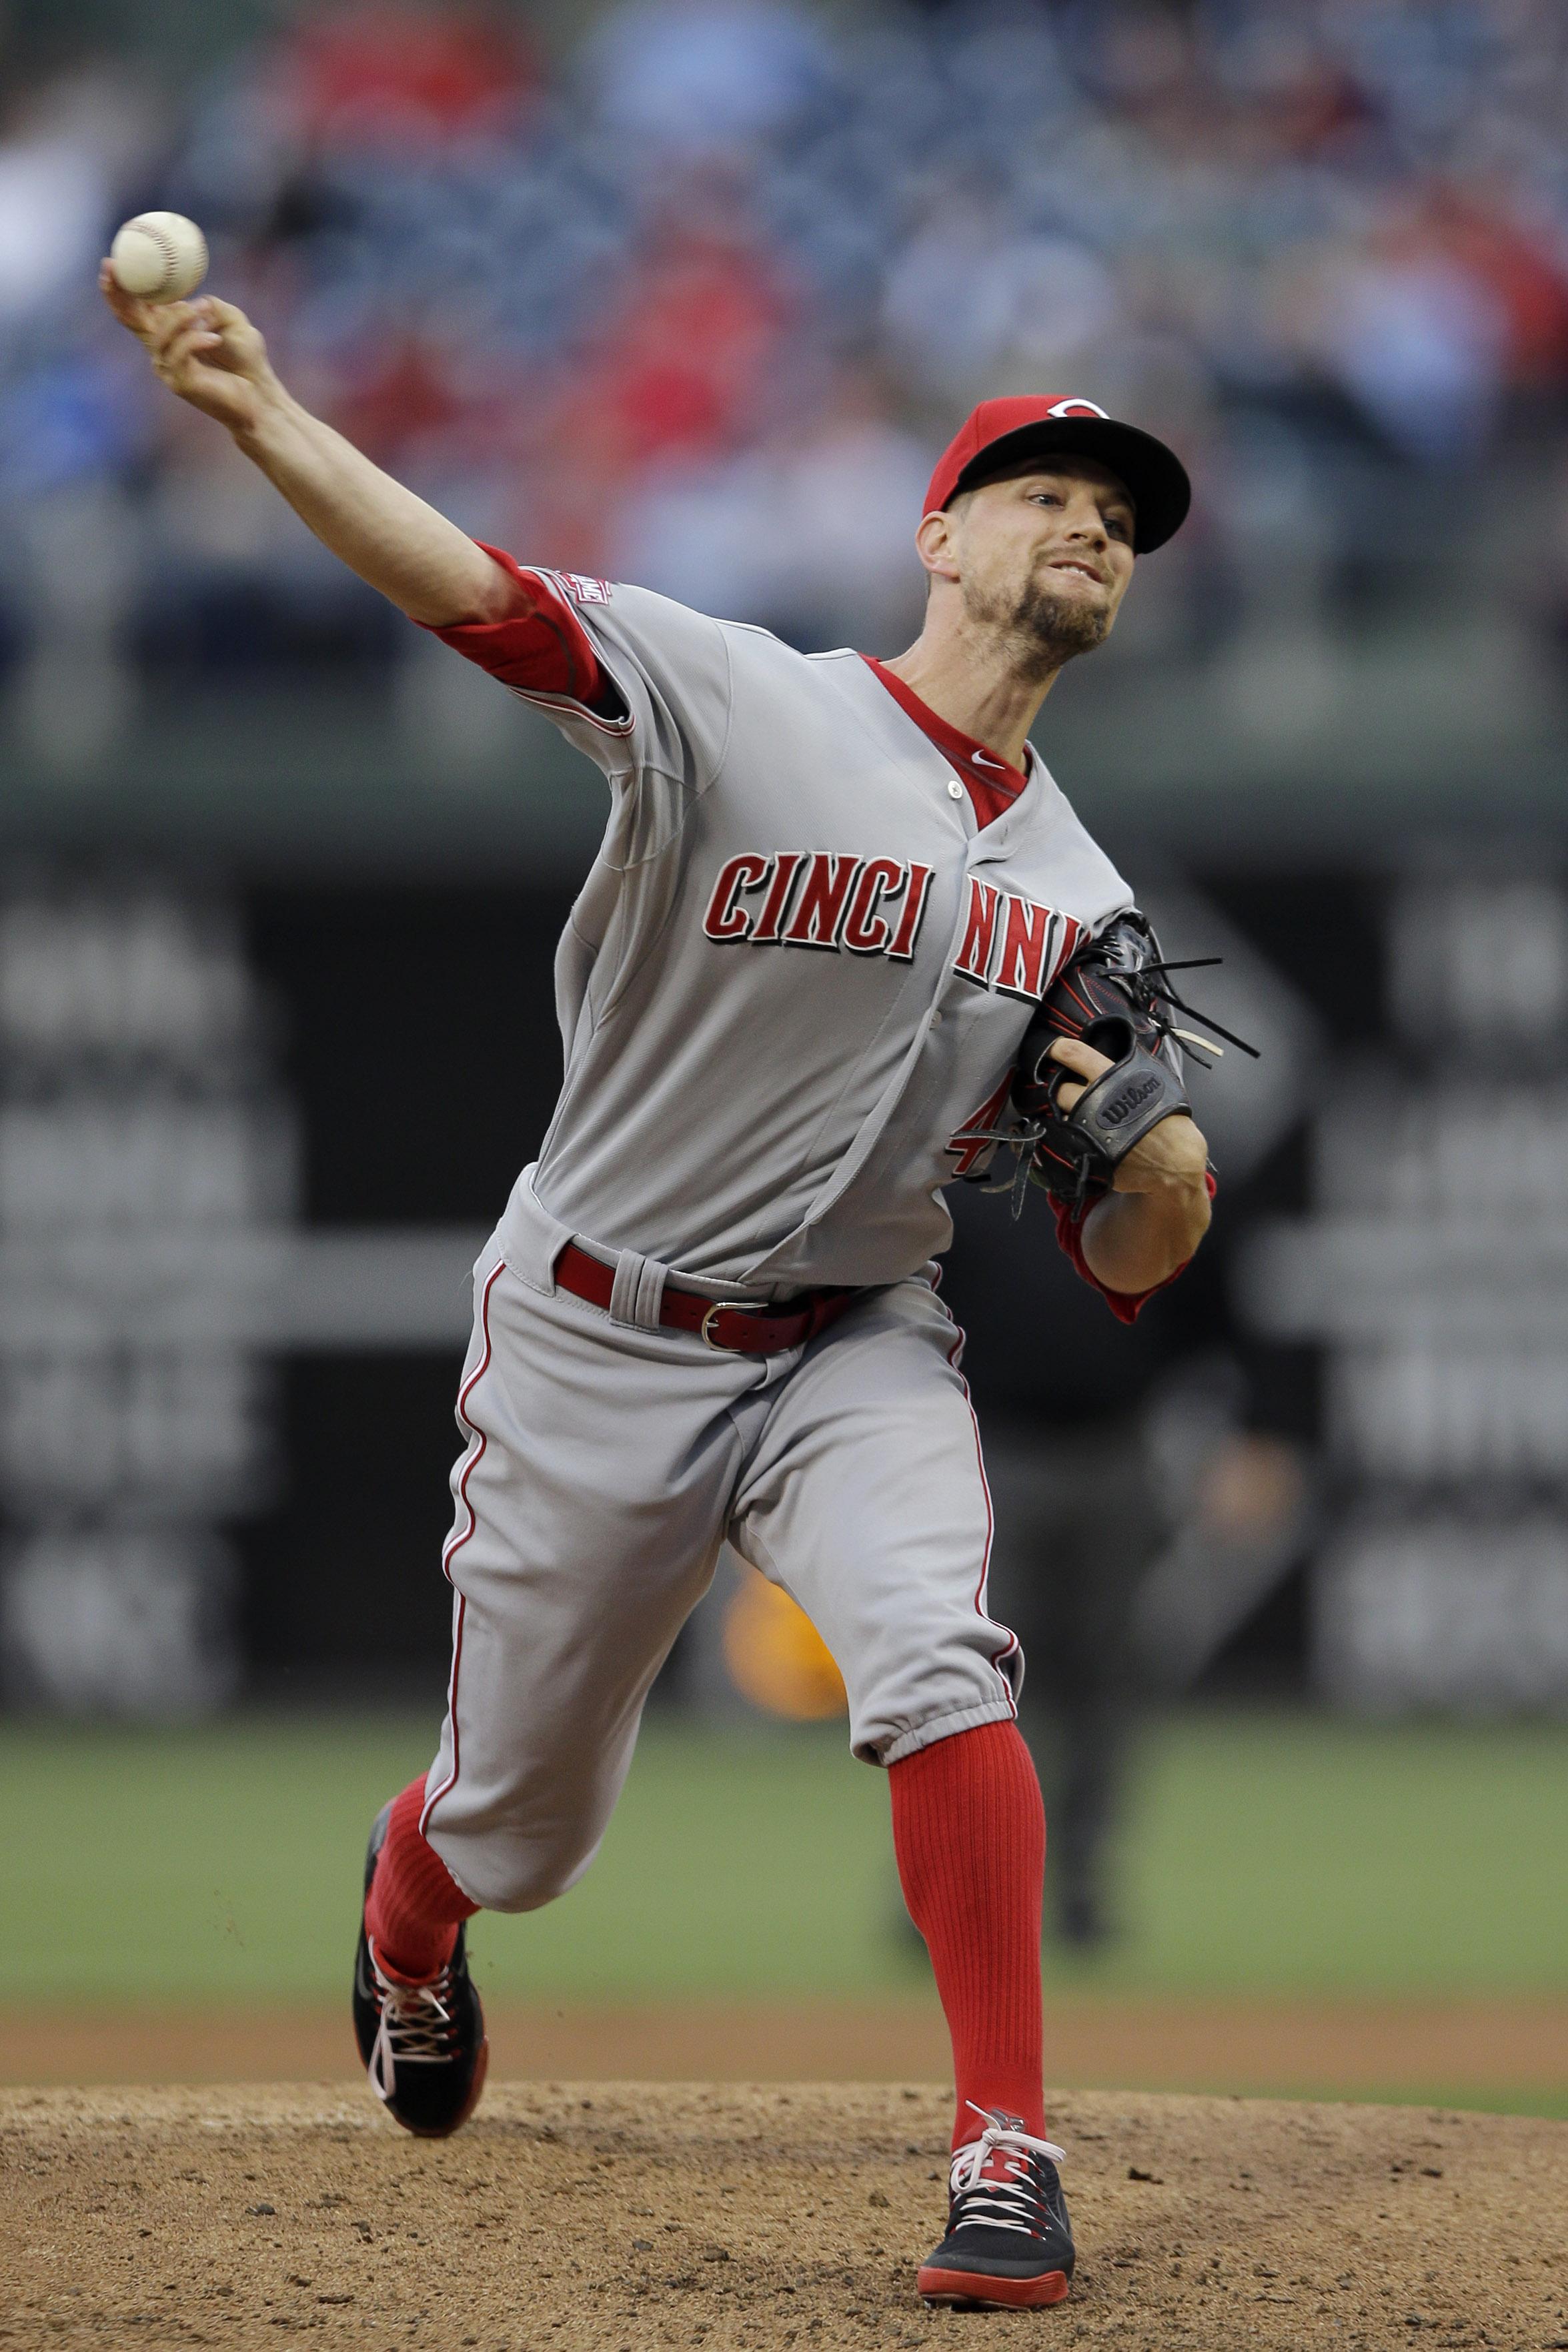 Cincinnati Reds' Mike Leake pitches during the third inning of a baseball game against the Philadelphia Phillies, Wednesday, June 3, 2015, in Philadelphia. (AP Photo/Matt Slocum)